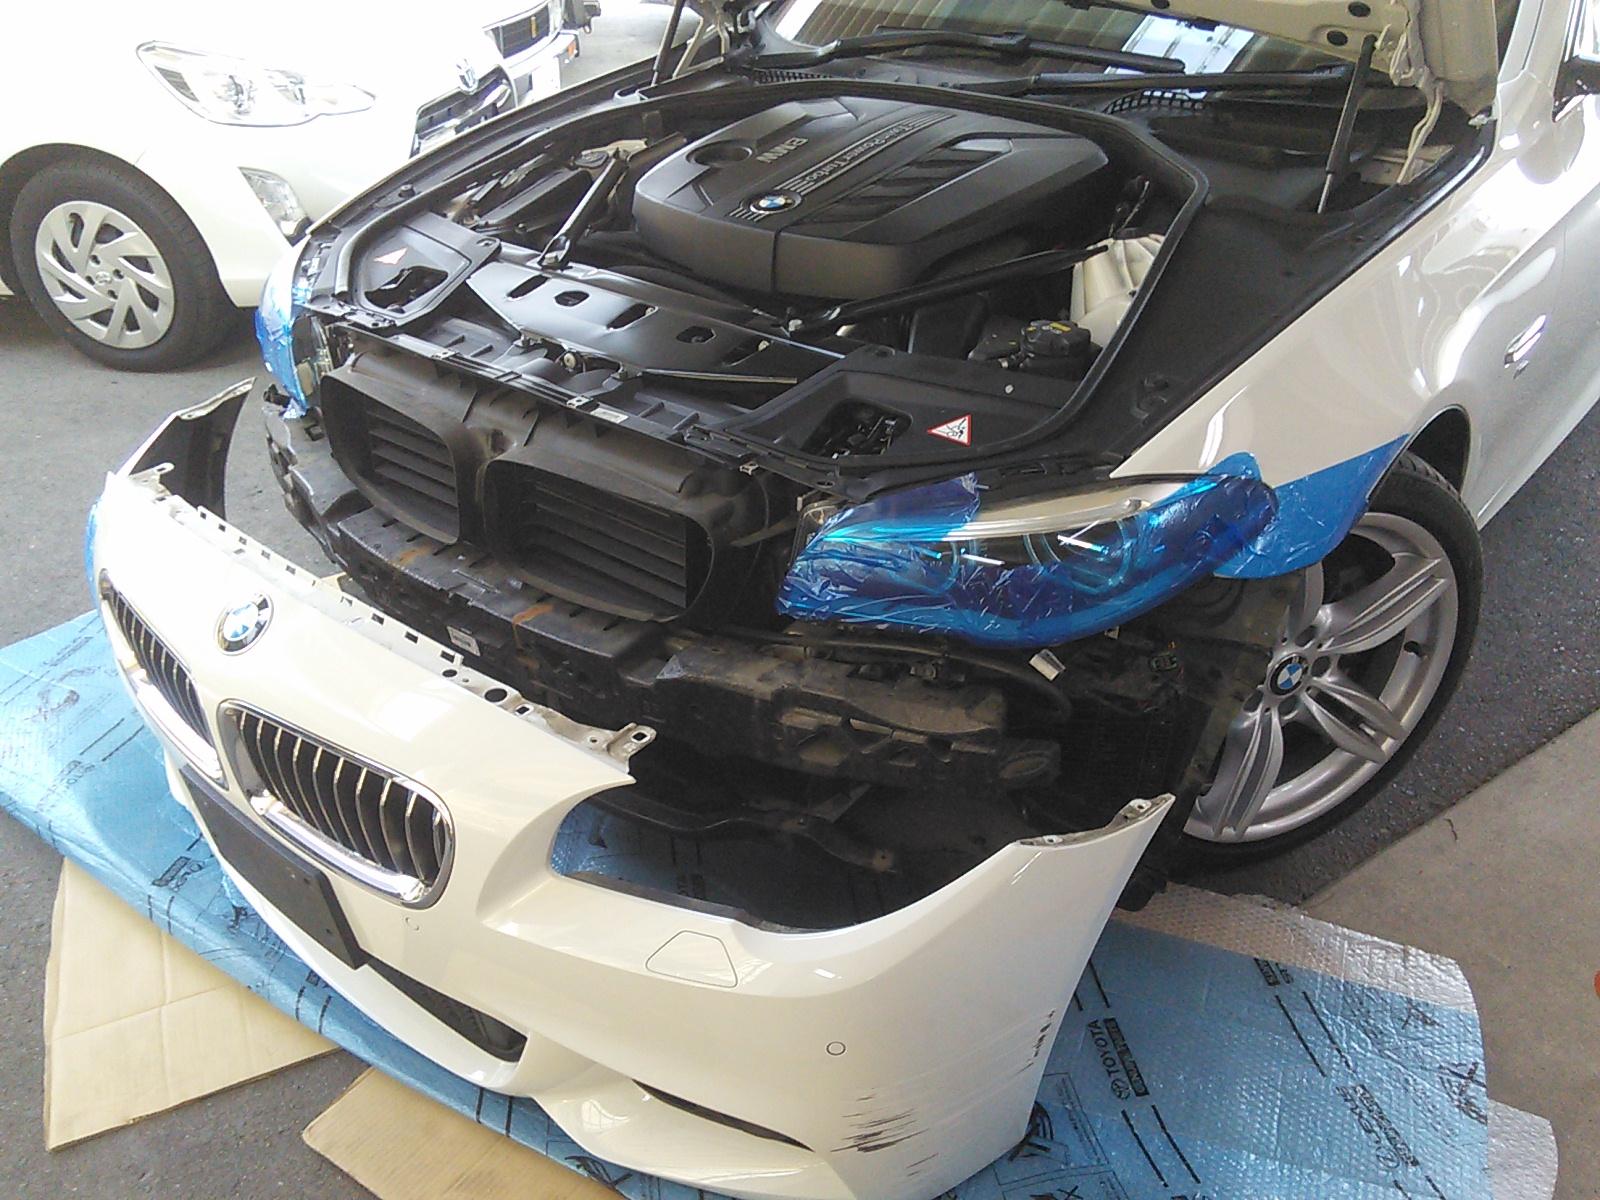 BMW祭り 今回はM3 フェンダー交換  豊田市  板金塗装